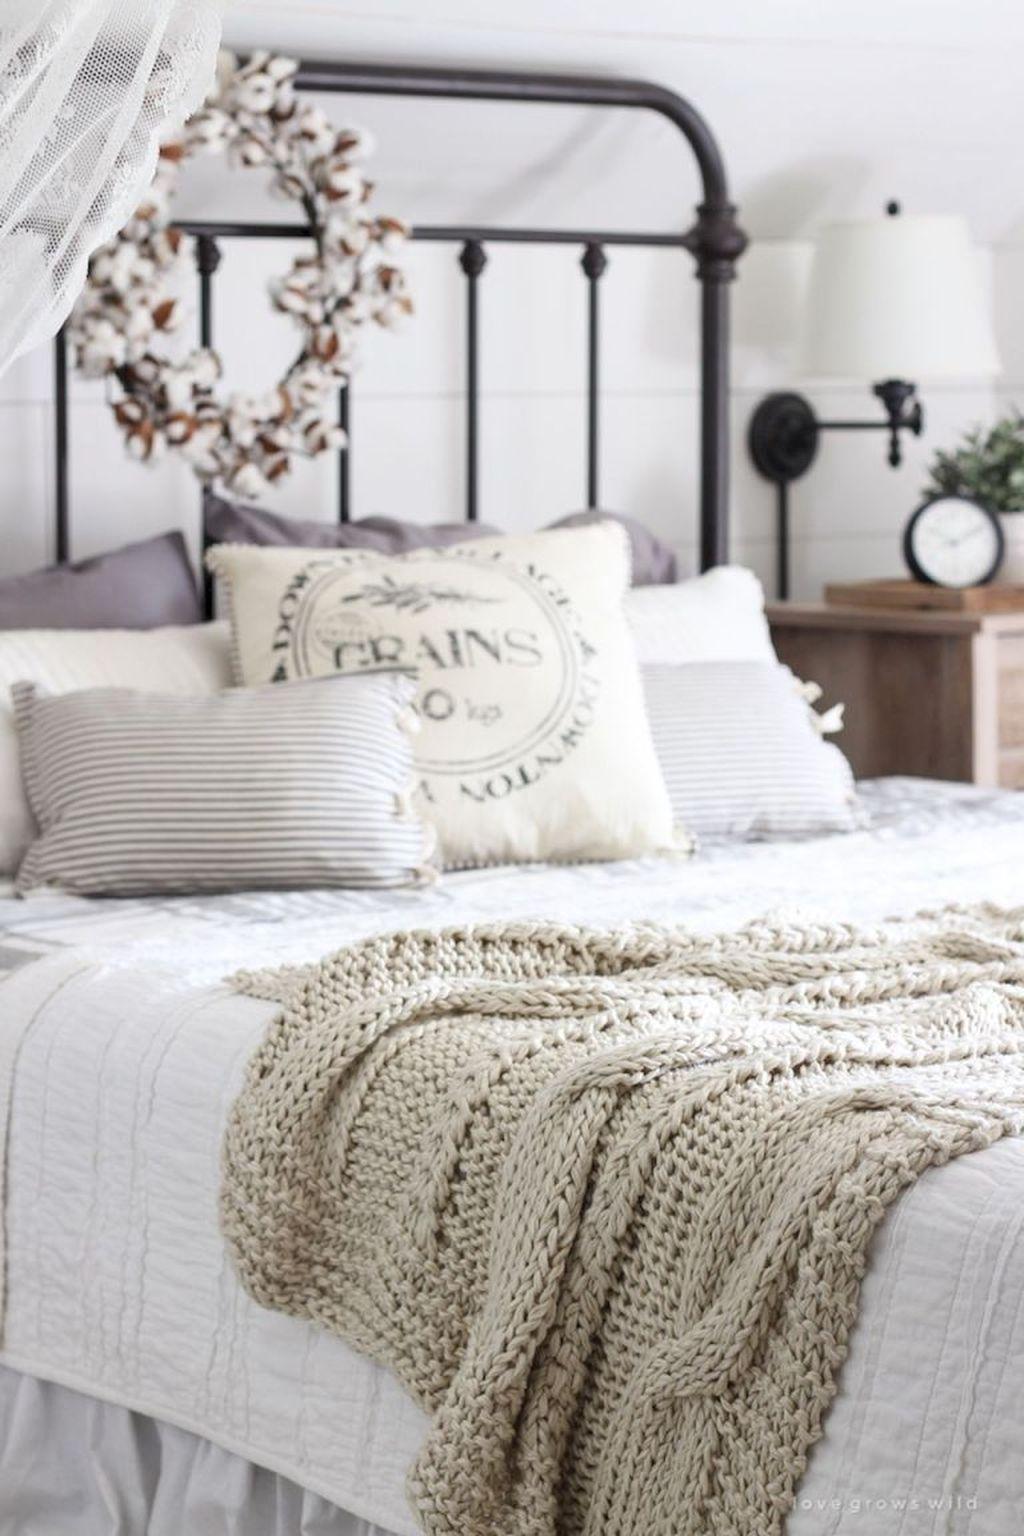 Romance Romantic Bedroom Ideas: 10 Romantic Bedroom Ideas For Couples In Love